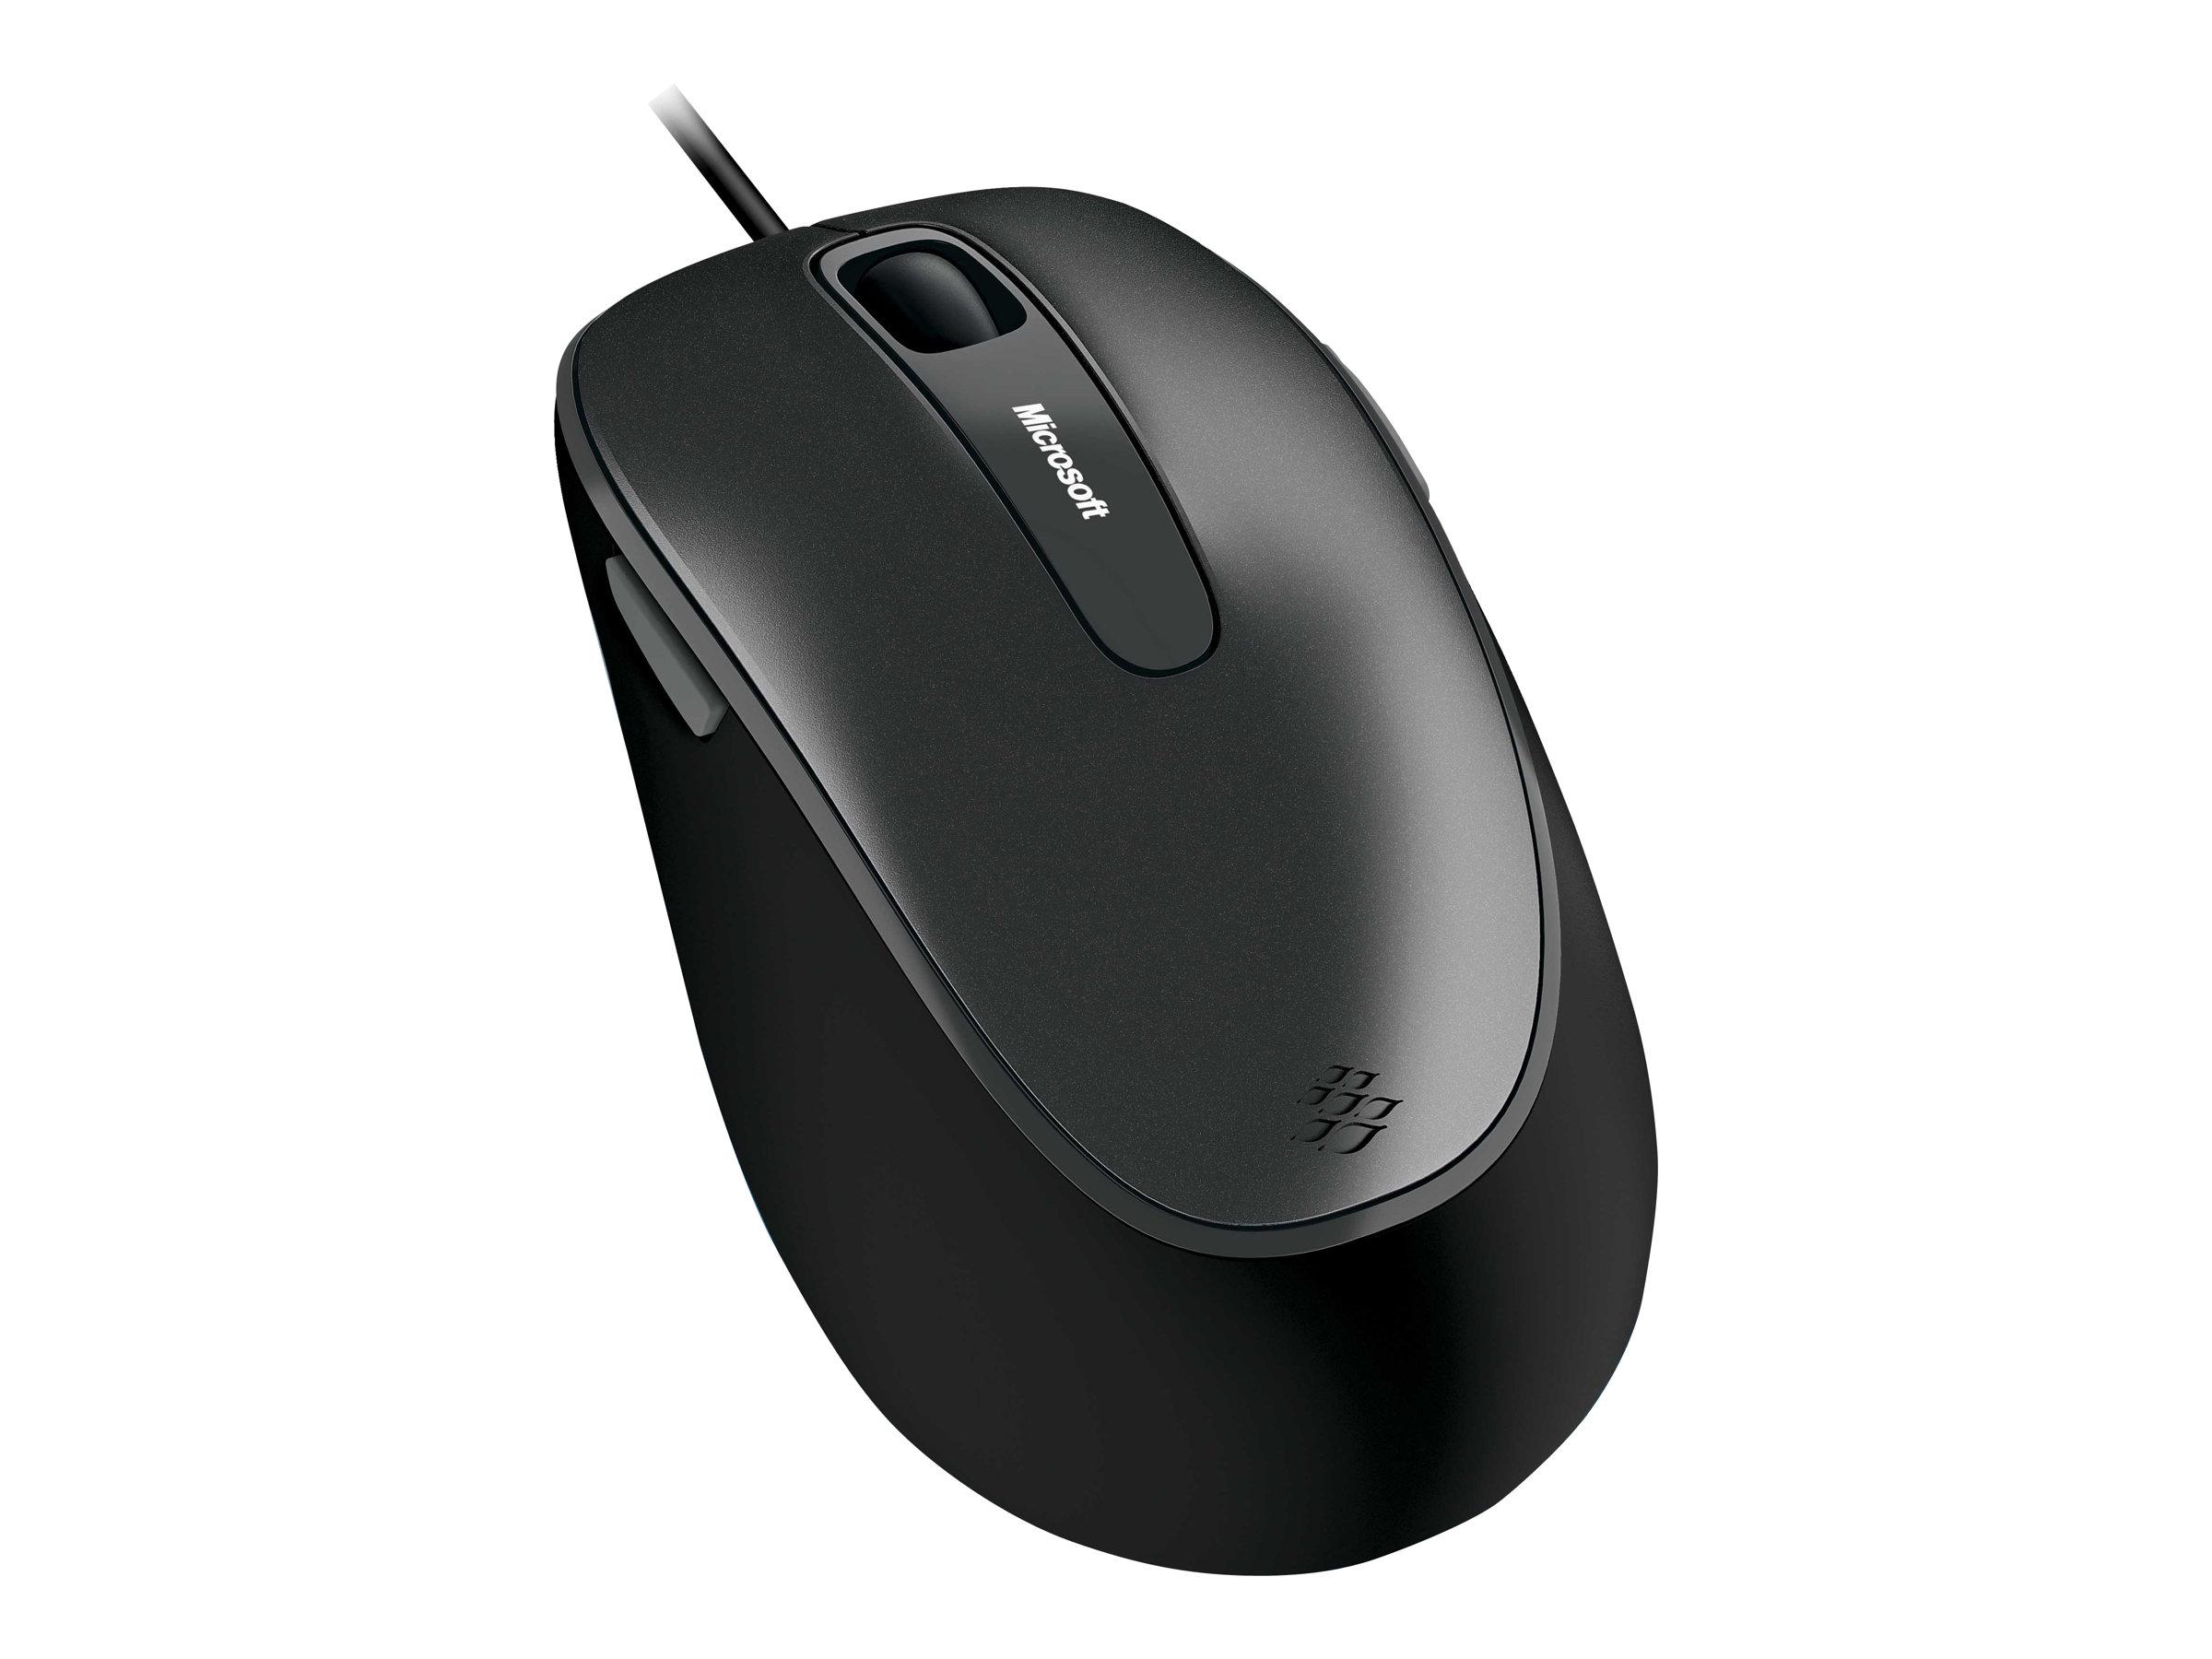 Comfort mouse 4500 maus optisch 5 tasten kabelgebunden usb 2996969 4fd 00023